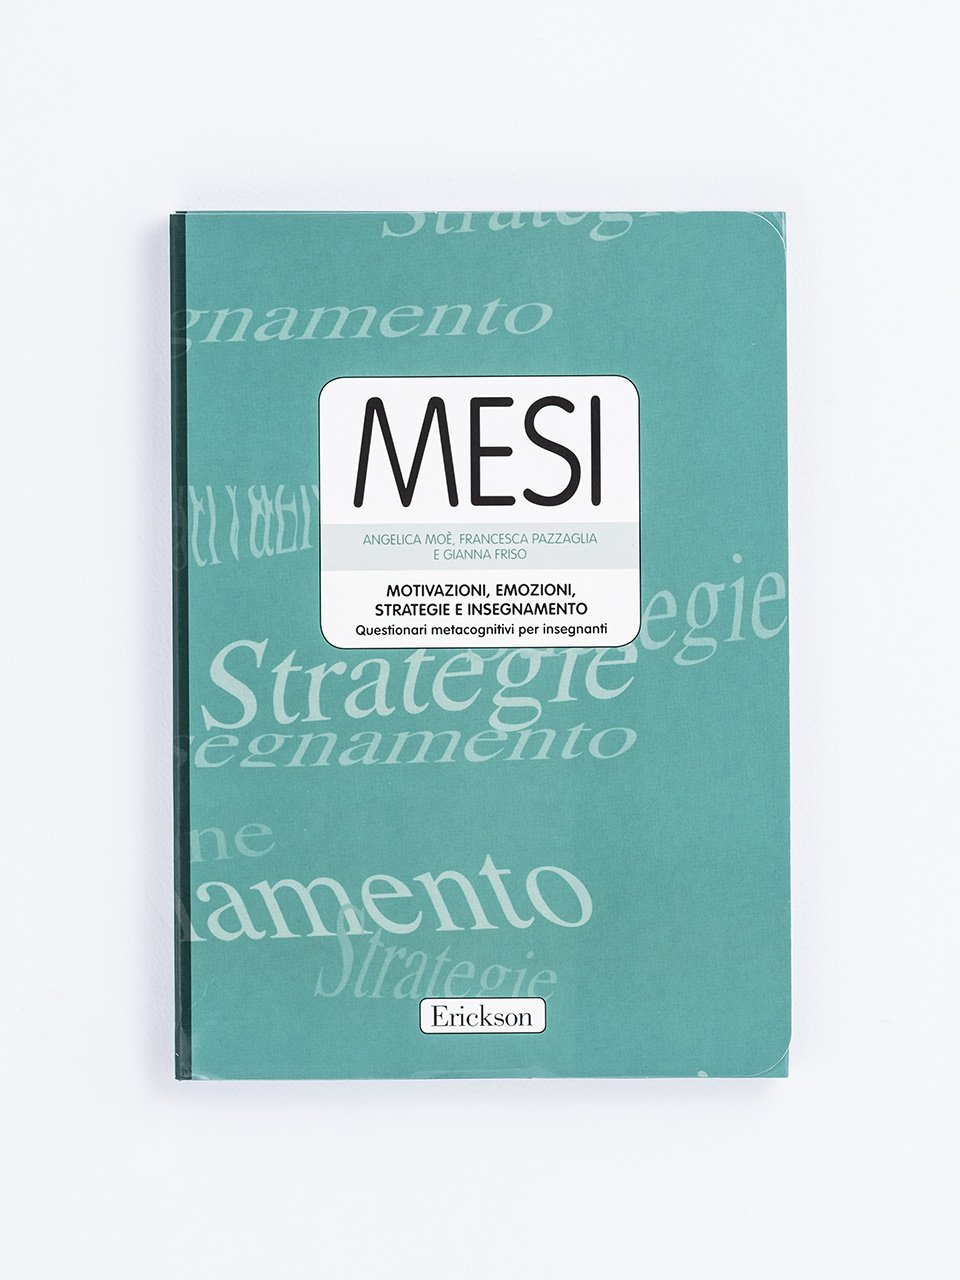 MESI - Motivazioni, Emozioni, Strategie e Insegnamento - Gianna Friso - Erickson